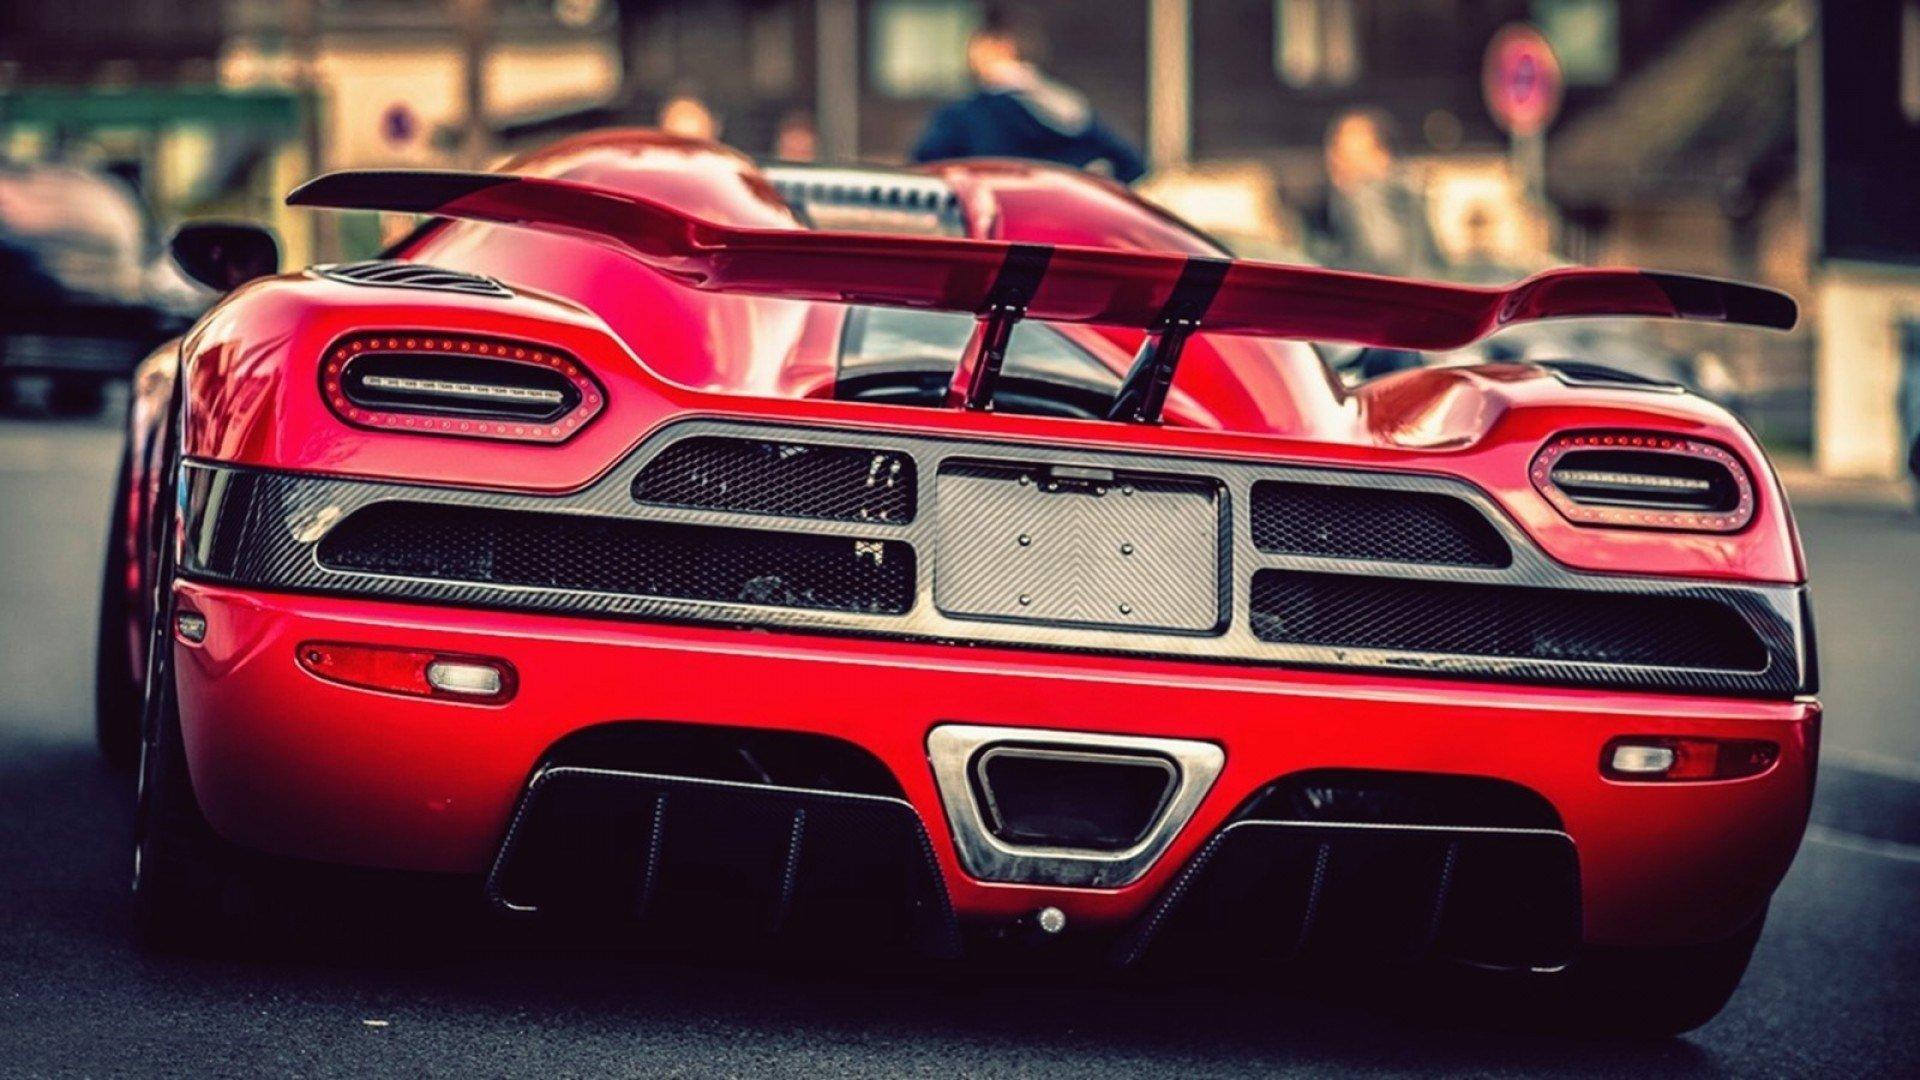 back cars koenigsegg koenigsegg agera r red cars